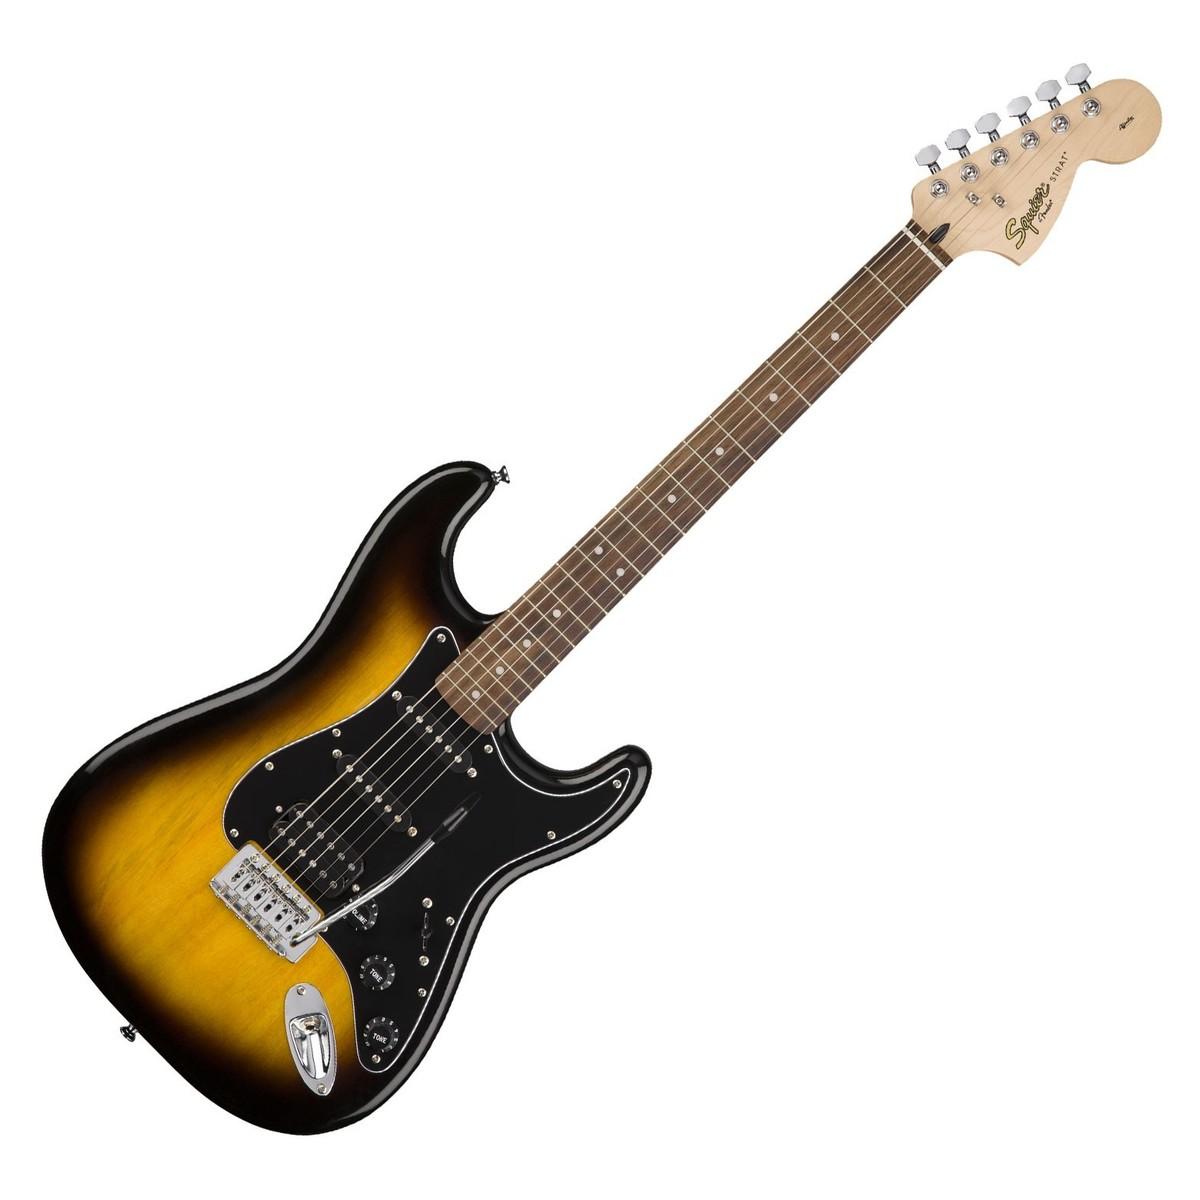 squier affinity stratocaster hss pack brown sunburst at gear4music. Black Bedroom Furniture Sets. Home Design Ideas